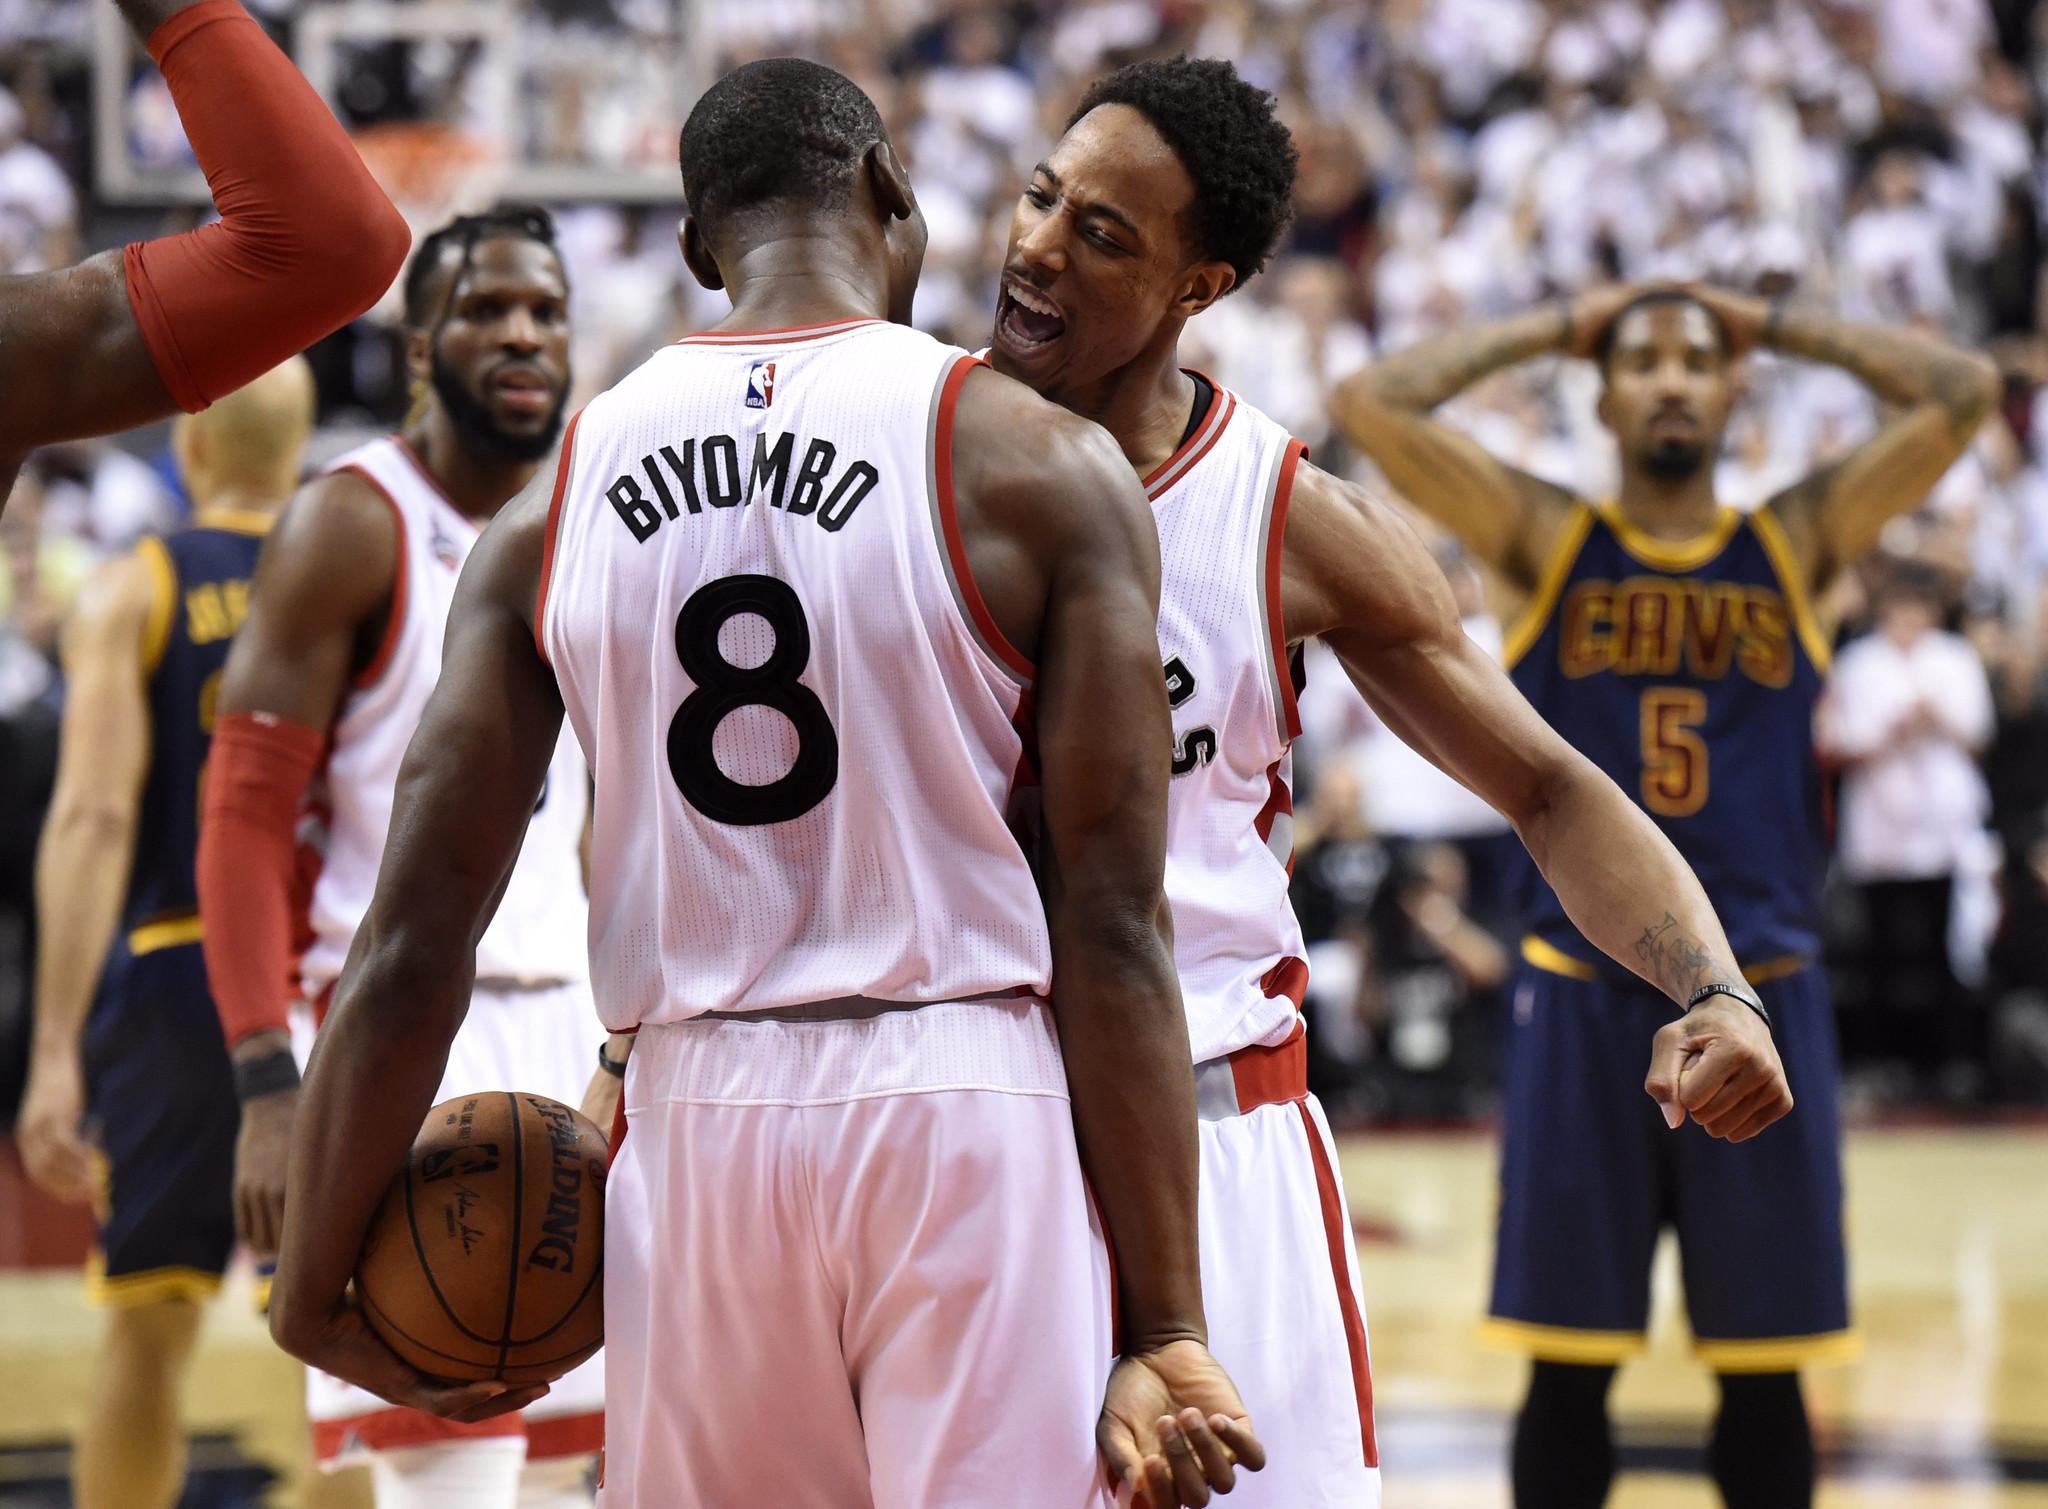 9f2c87272c90 Bismack Biyombo looks fondly on the Toronto Raptors - Orlando Sentinel